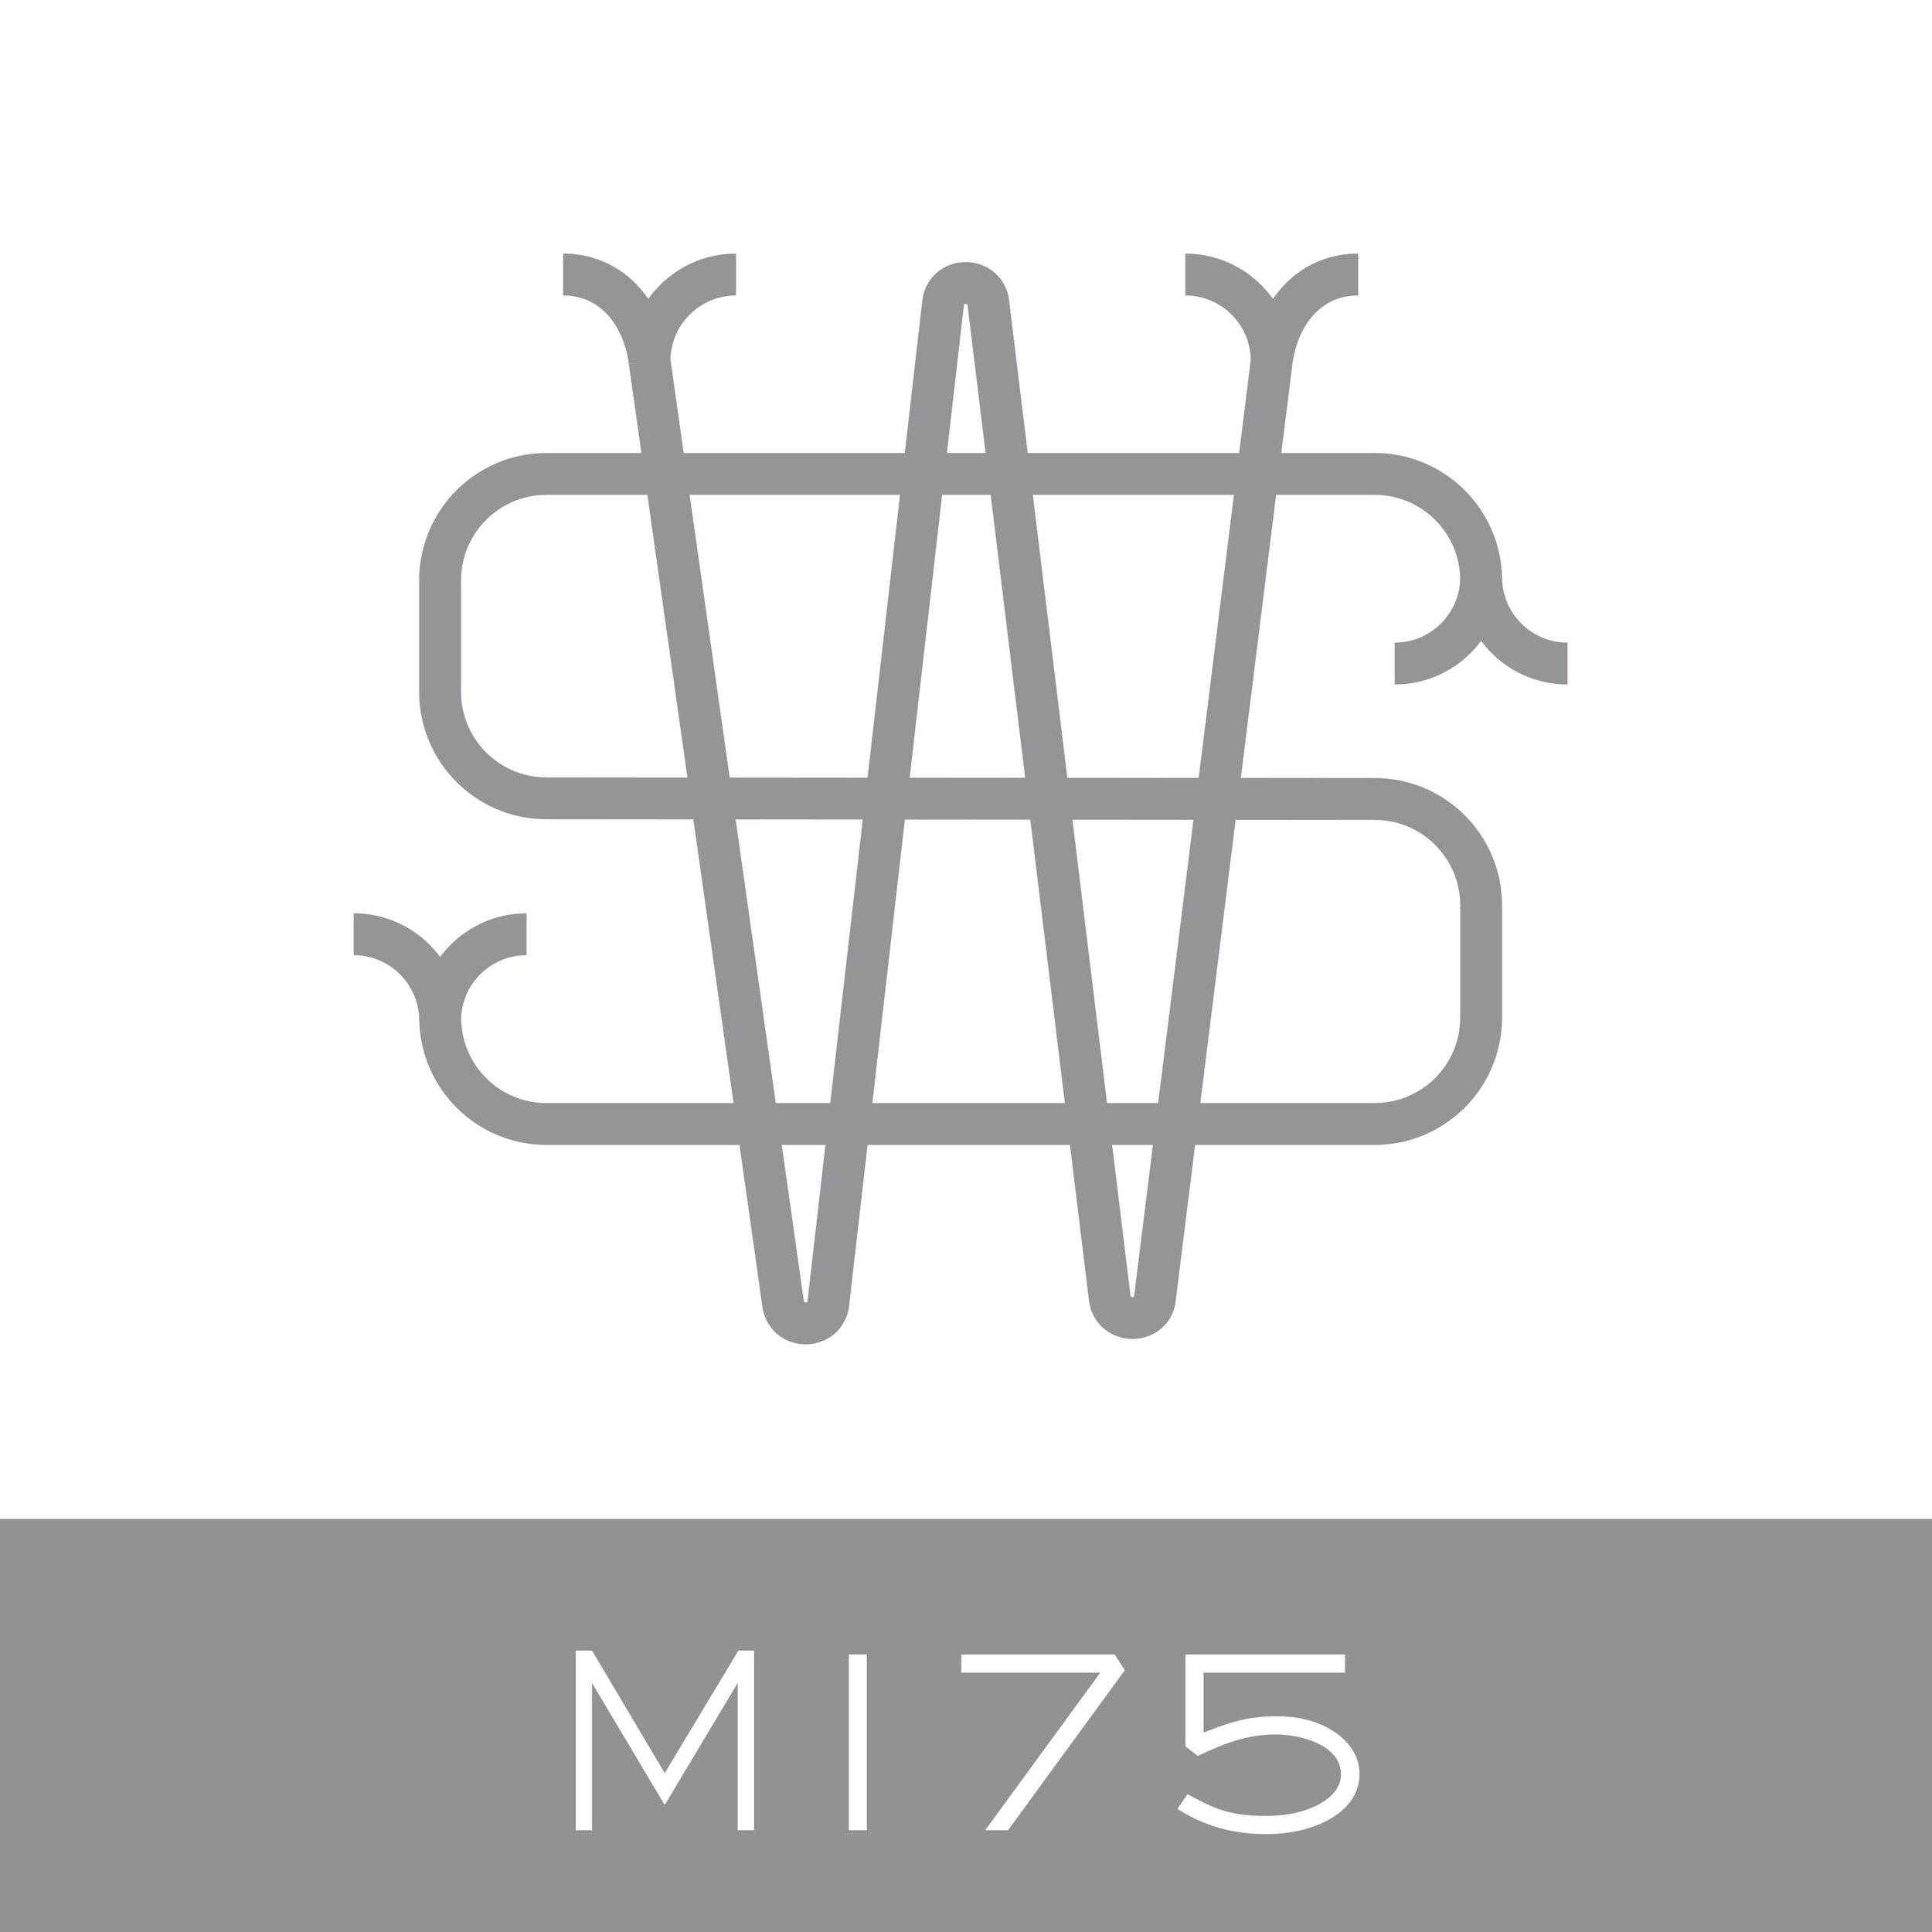 M175.jpg